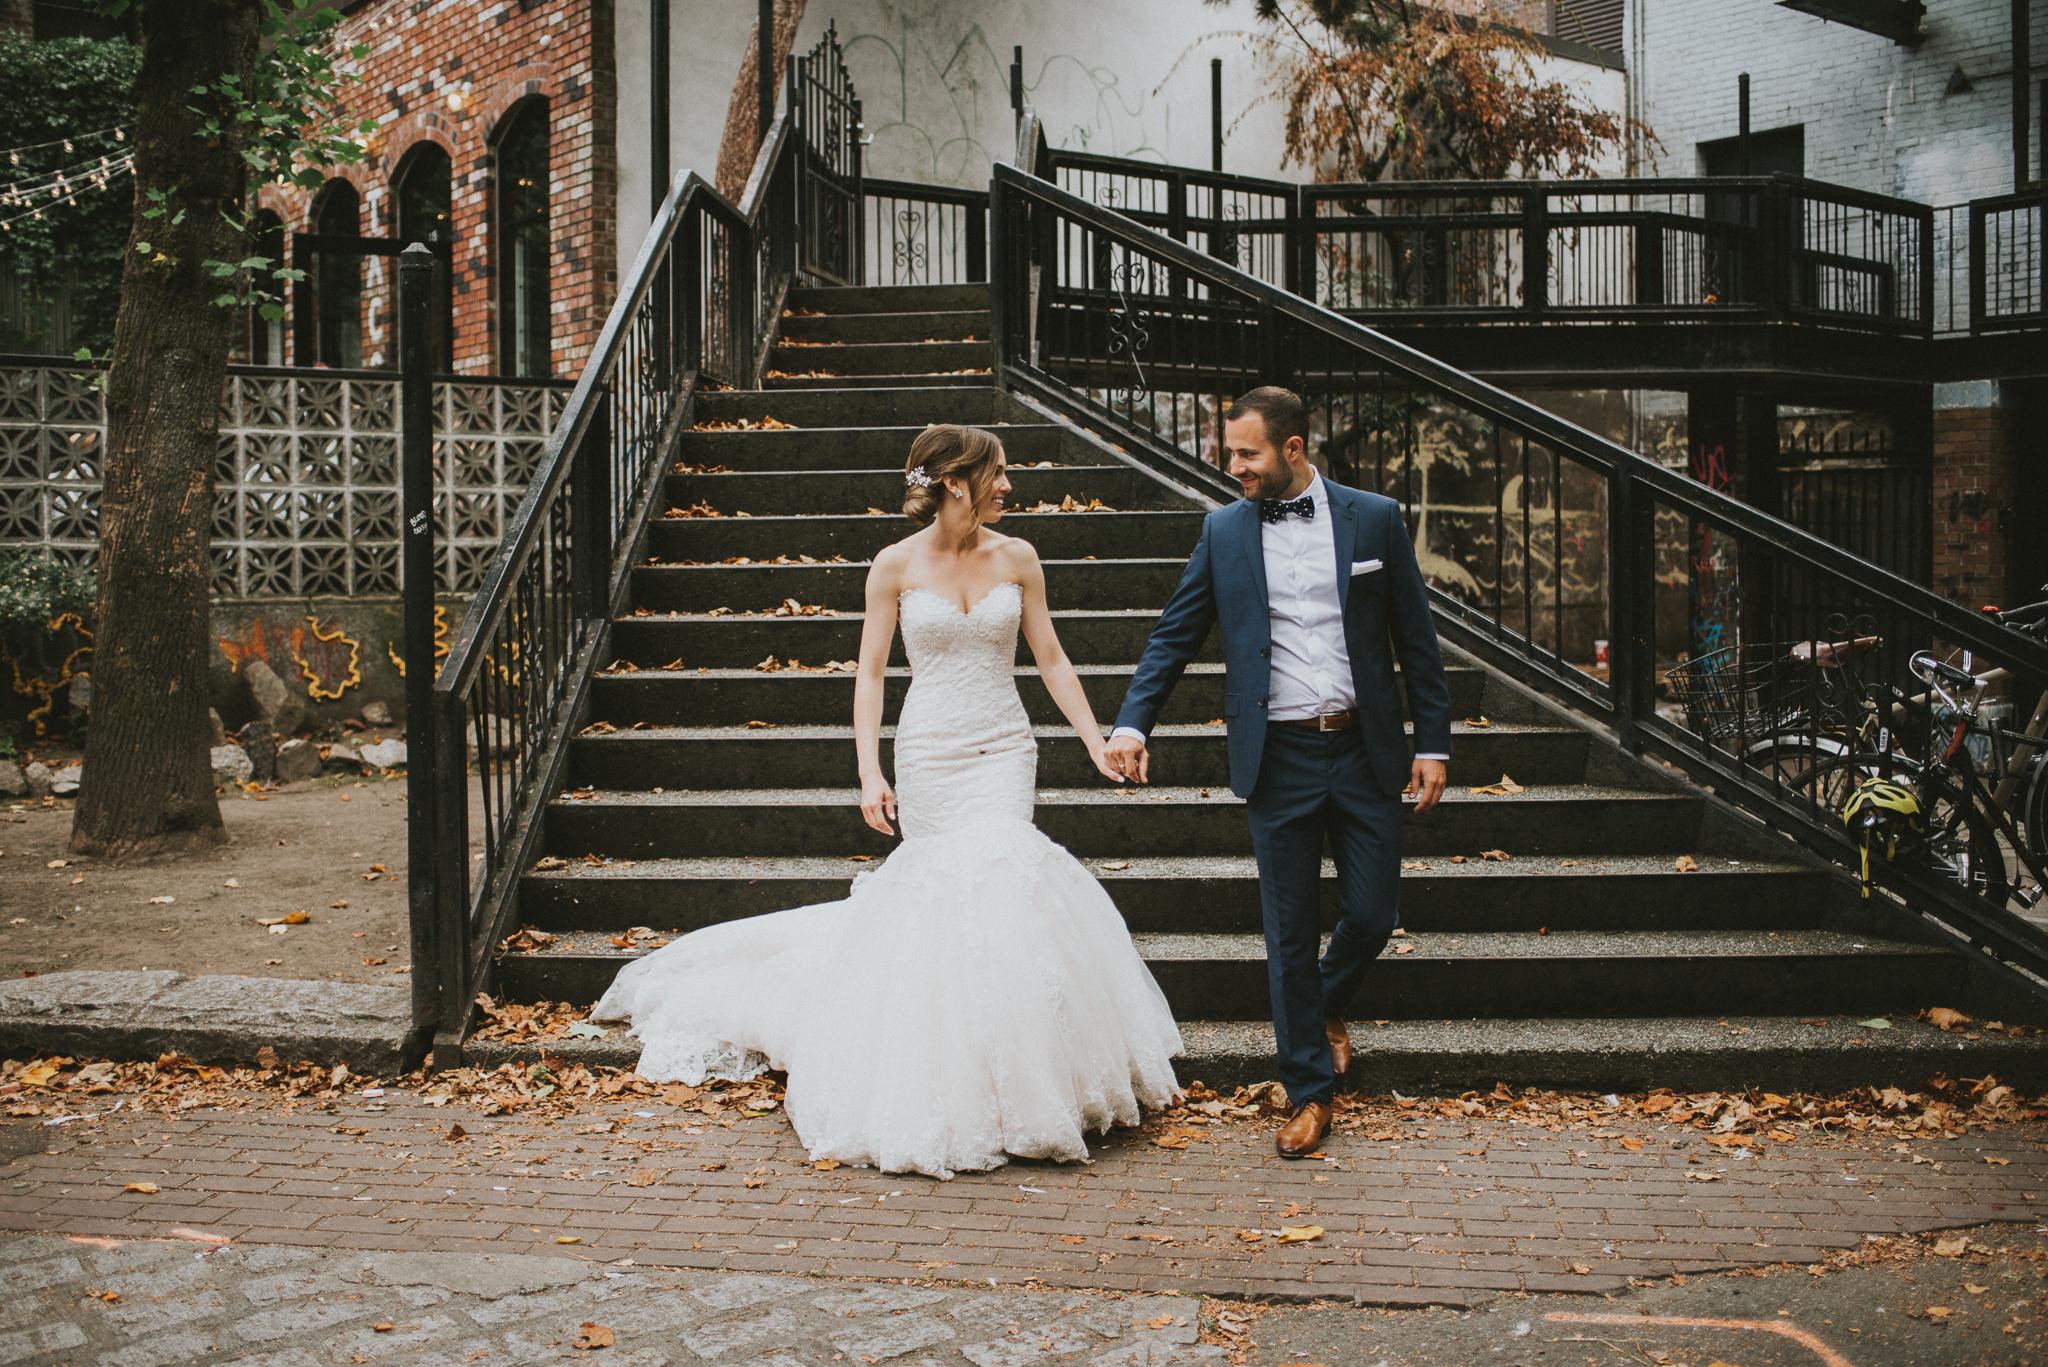 173-permanent-vancouver-wedding-courtneysteven-web-8771.jpg